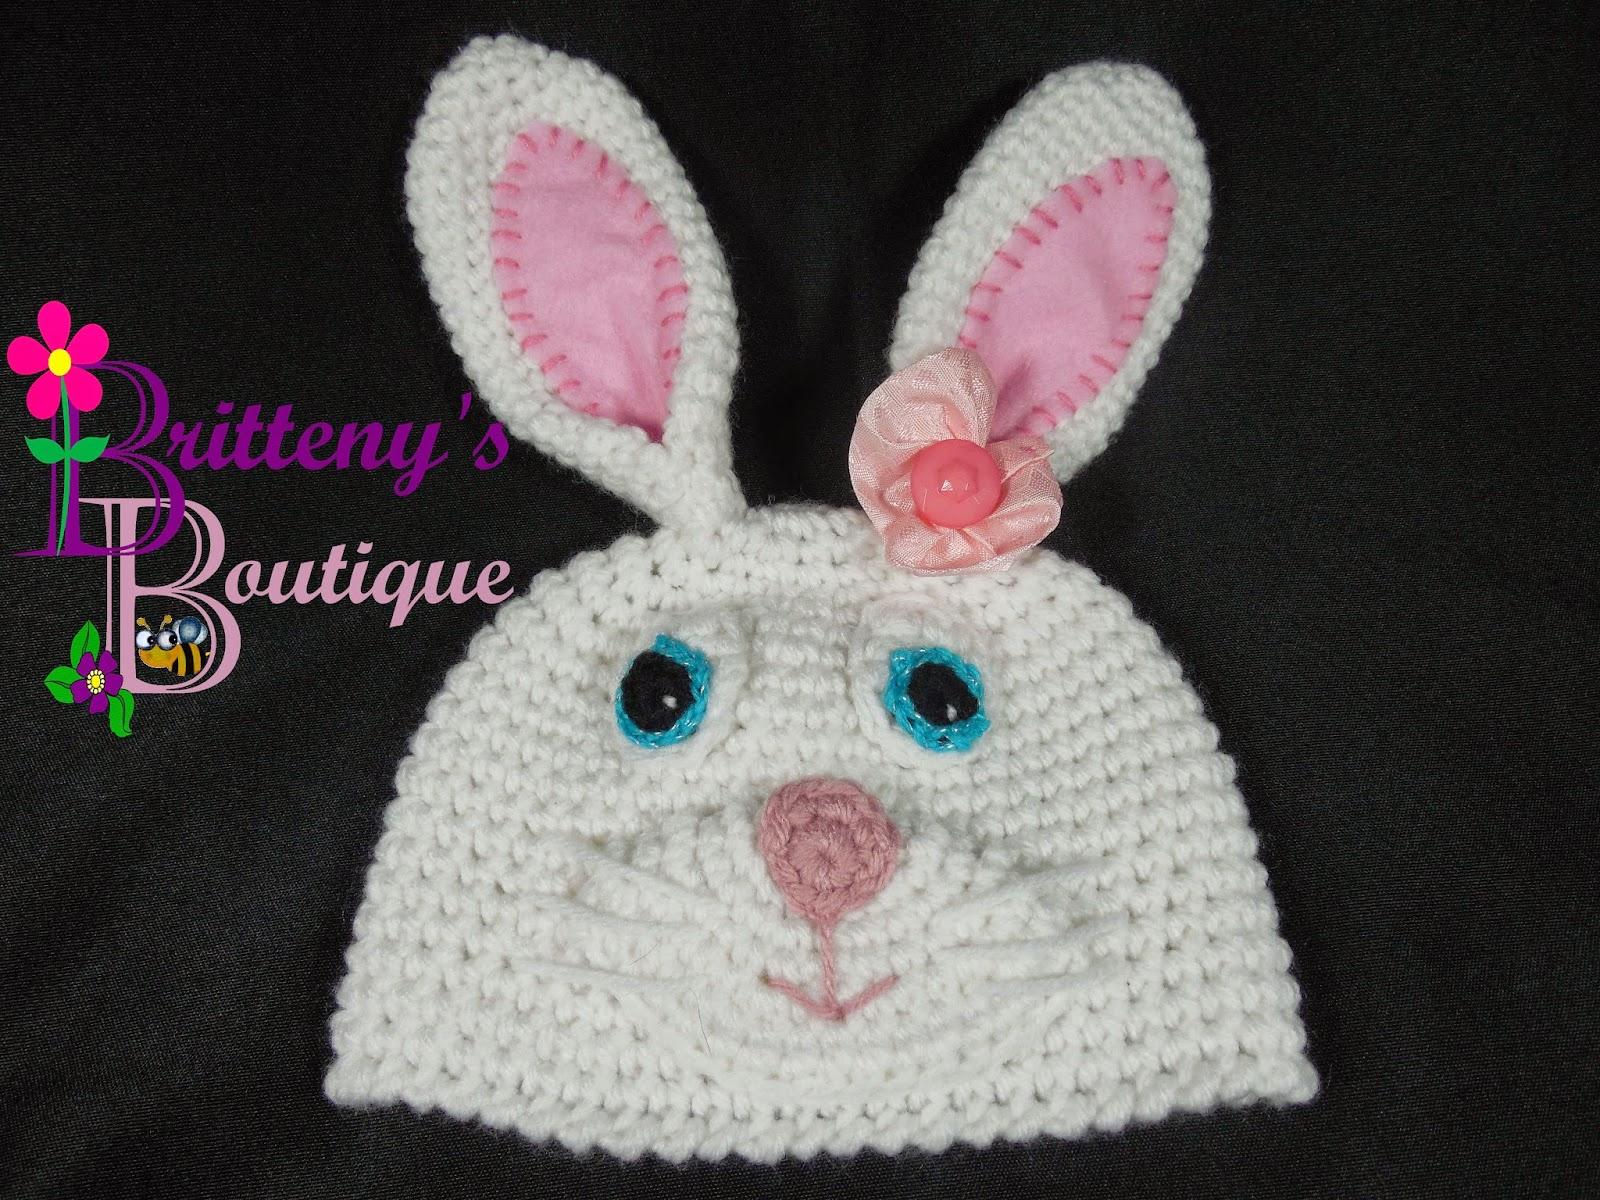 Britteny Off the HOOK!!: Bunny Rabbit Hat - Crochet Pattern - FREE PDF